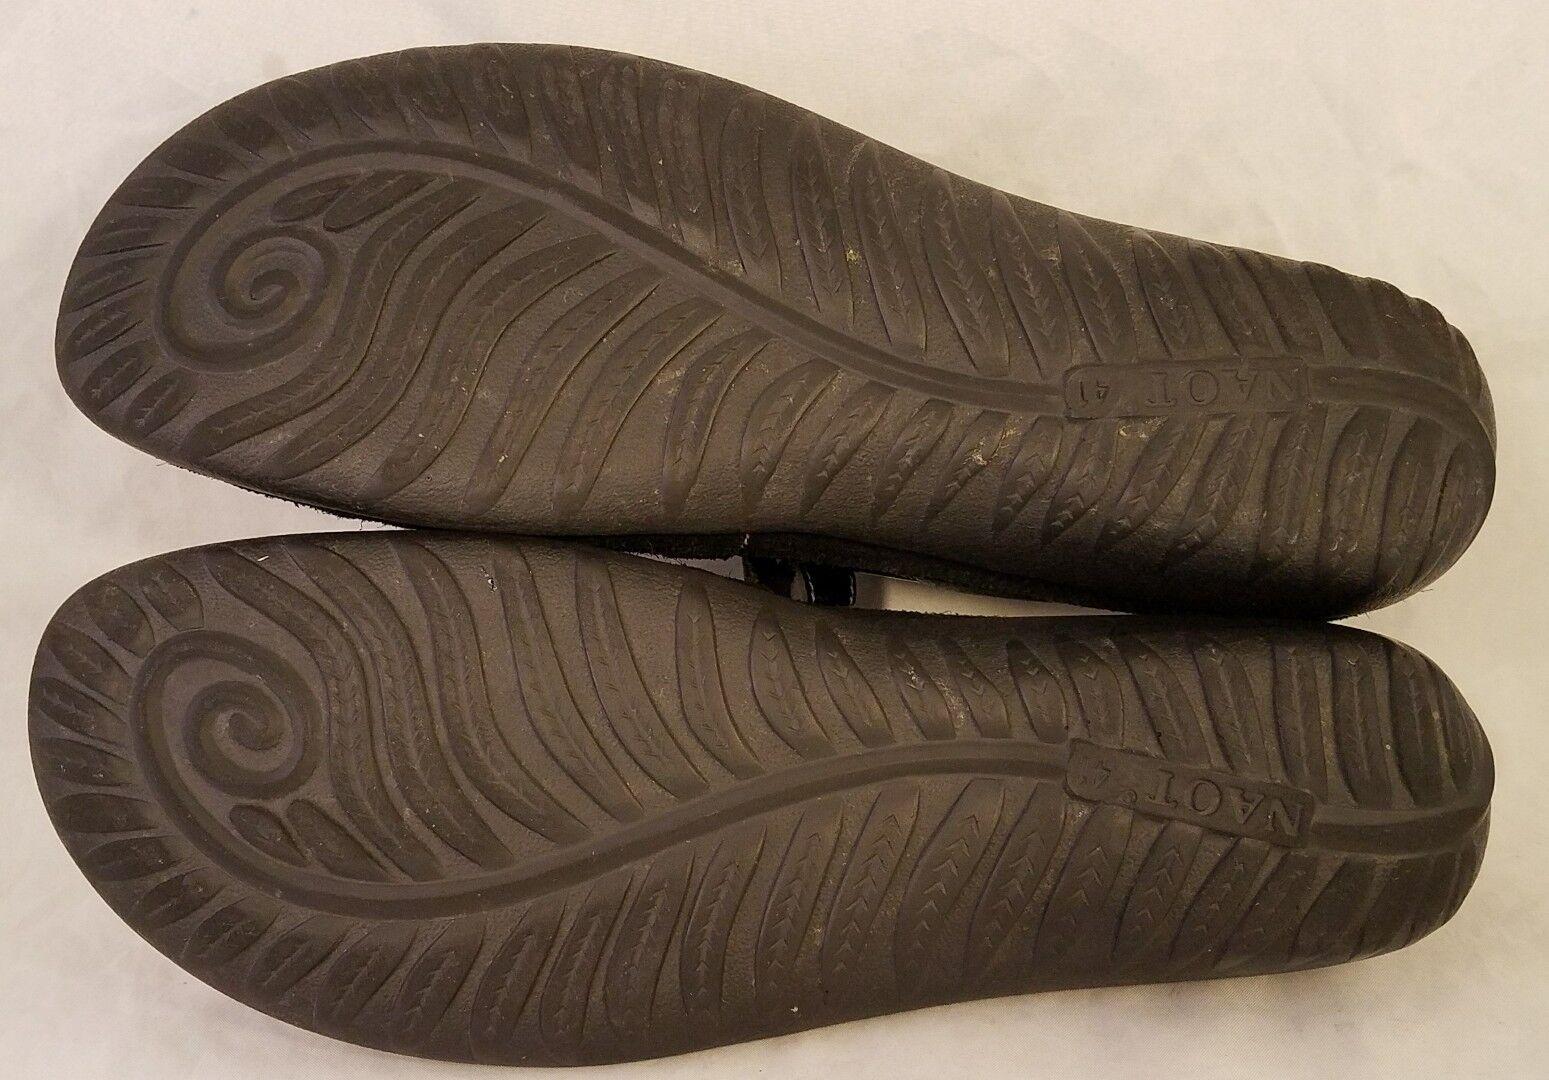 Größe Schuhe 41/US 10 NAOT FOOTWEAR Damenschuhe Schuhe Größe MARY JANES BLACK SUEDE 3c00cb